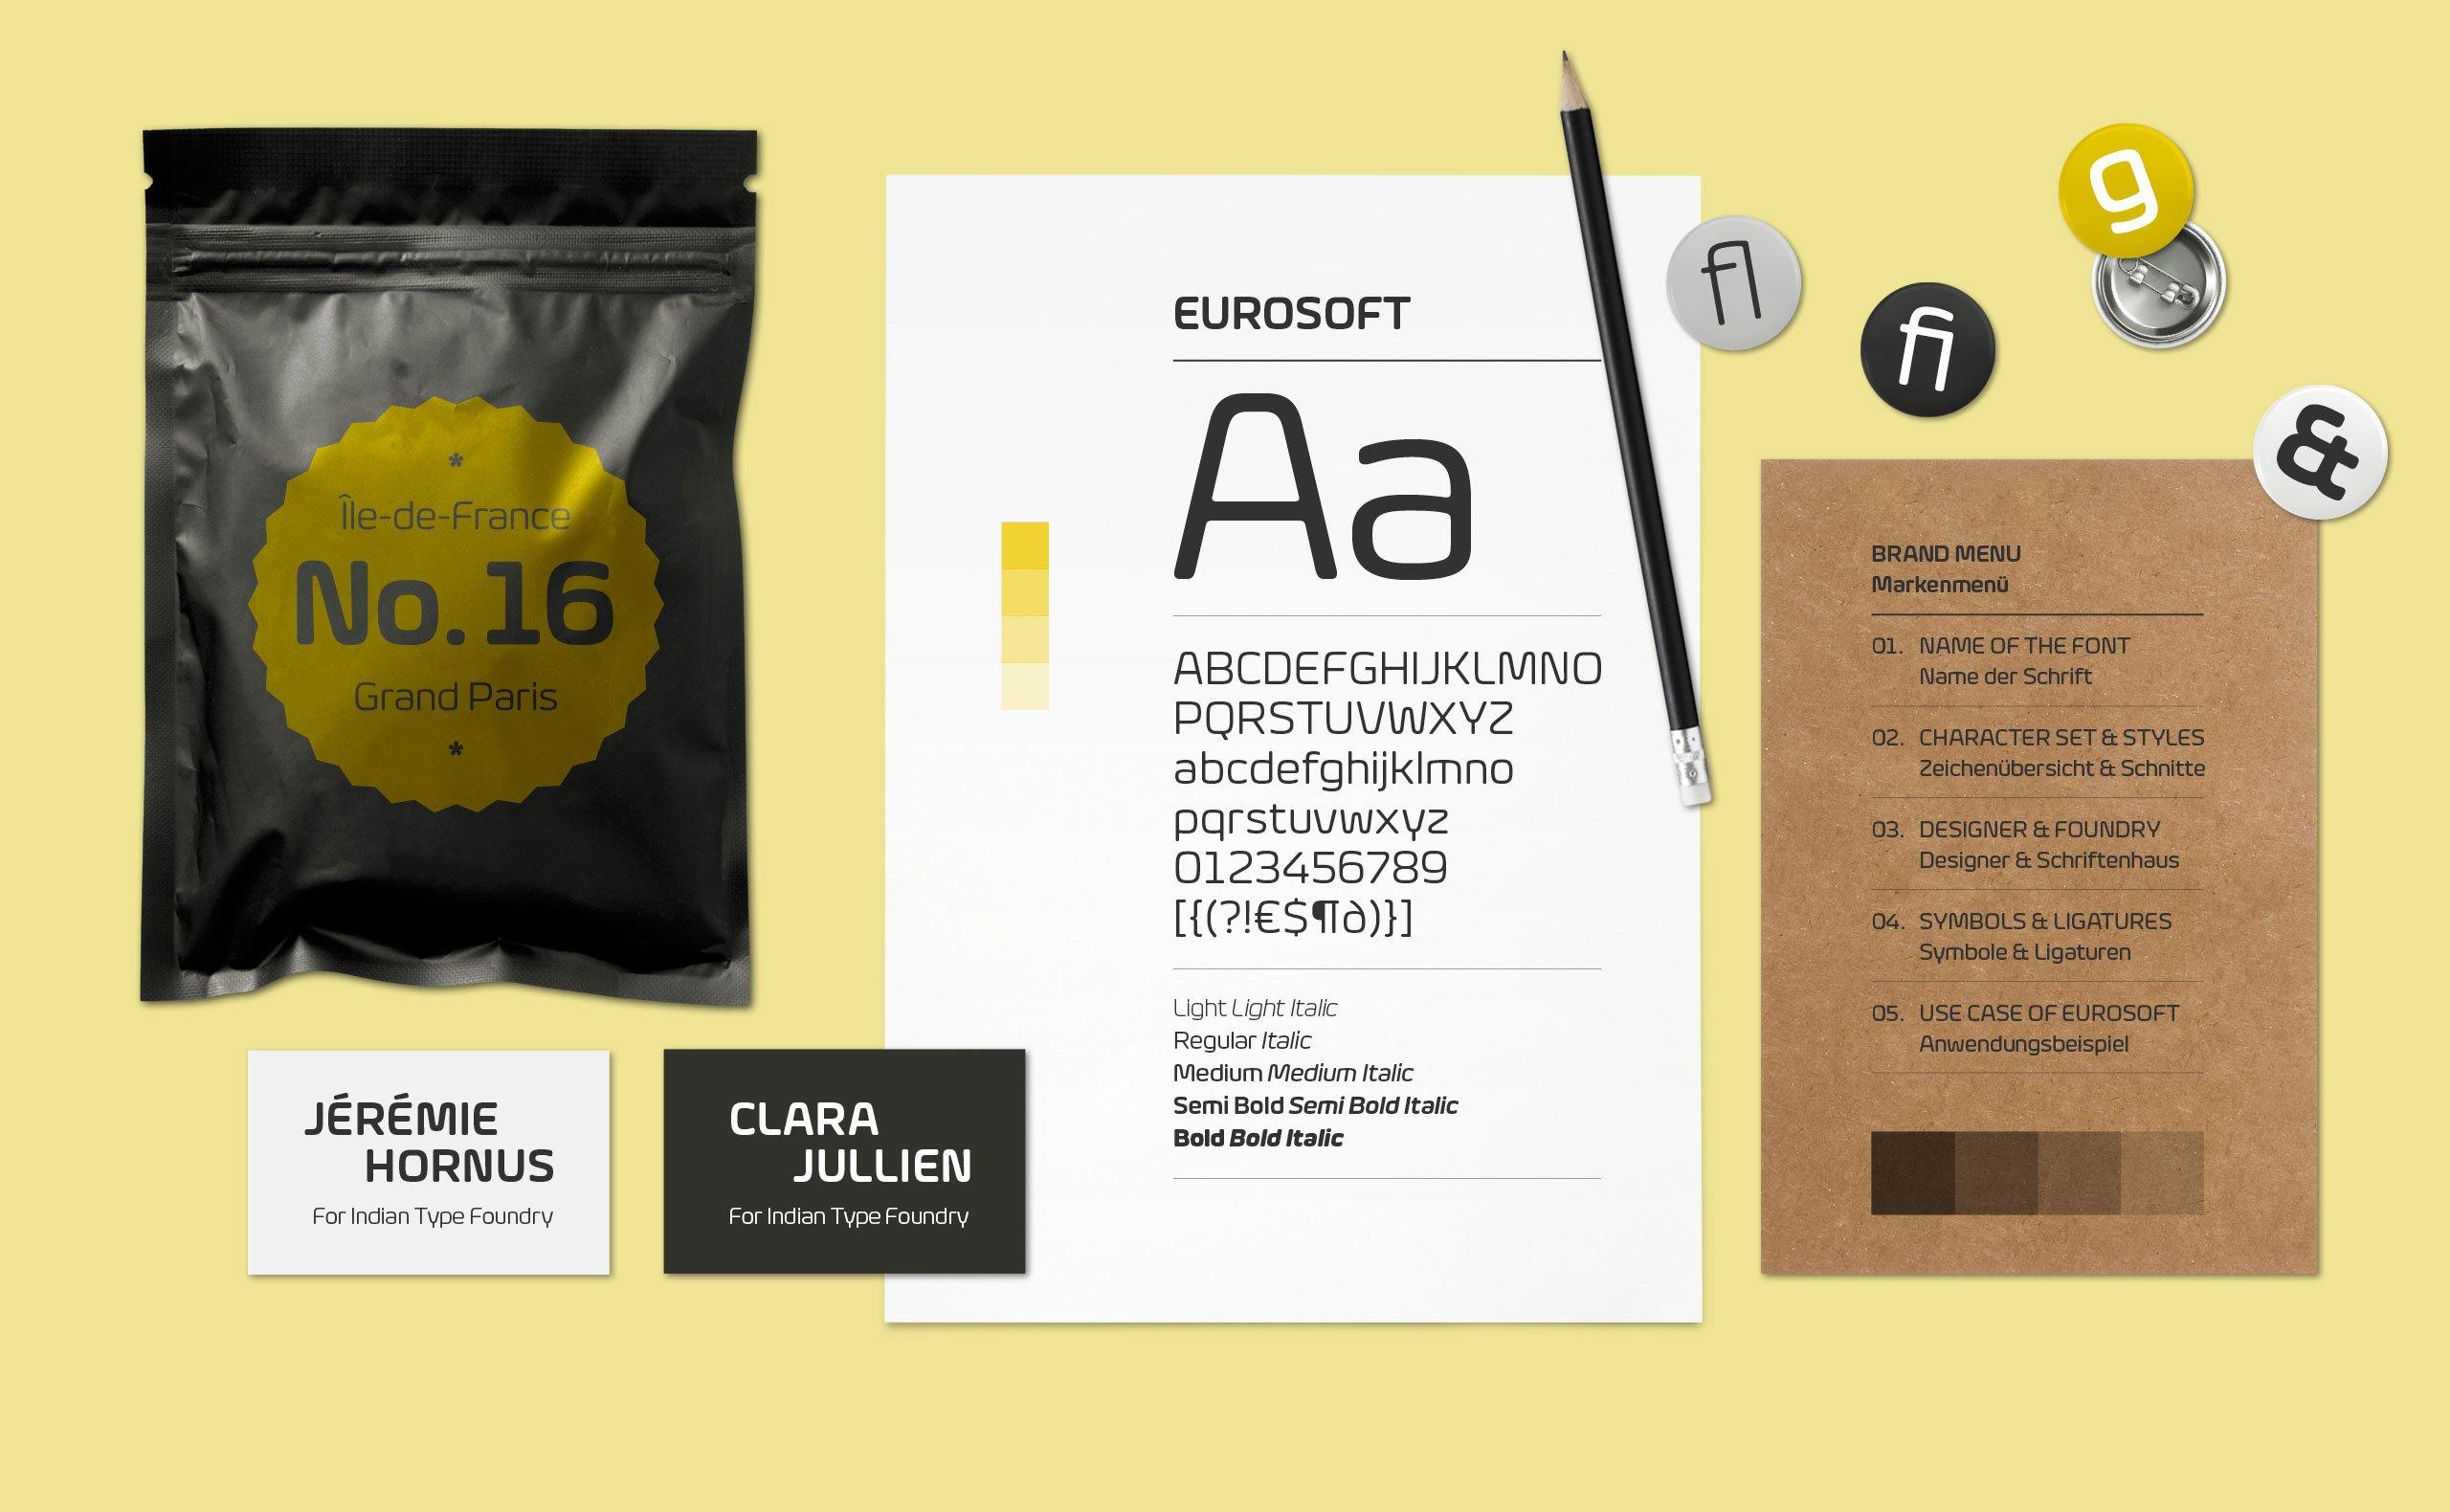 Fictitious use case for Eurosoft (Alexandra Schwarzwald)